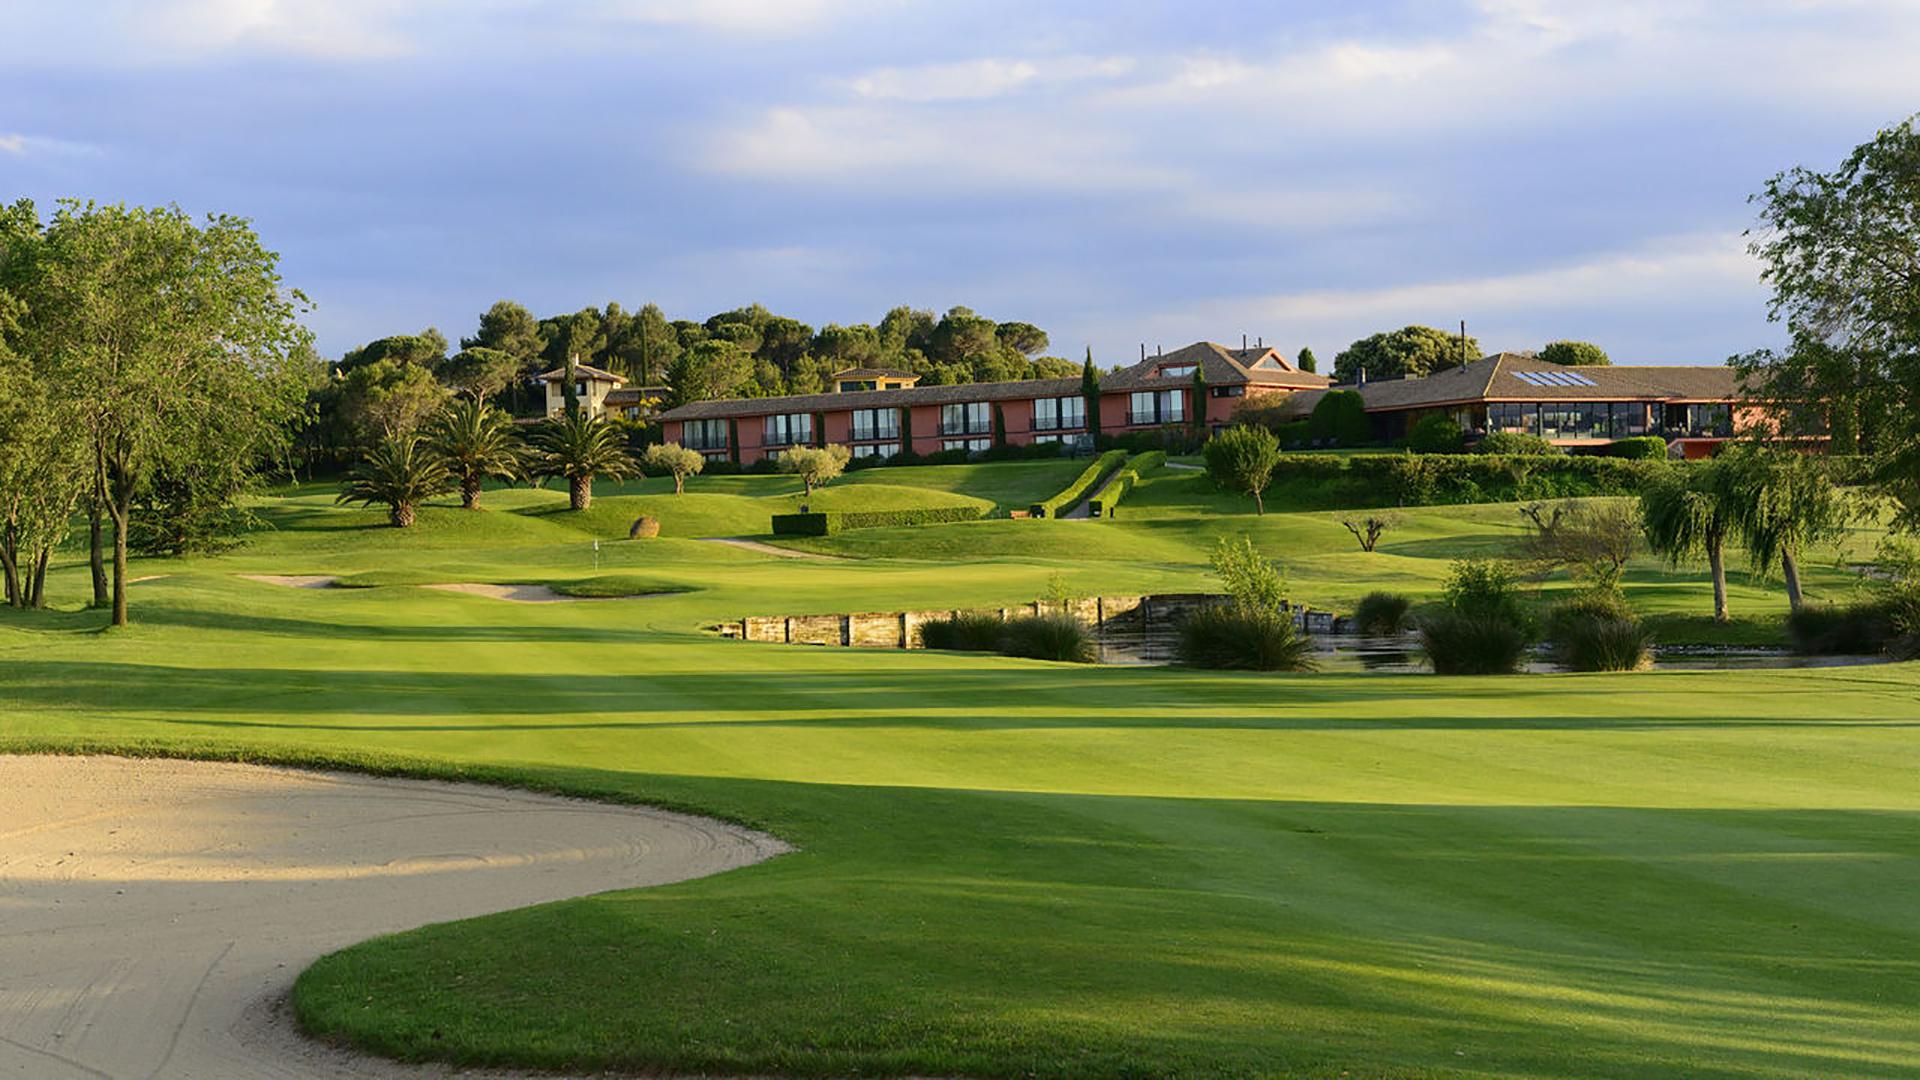 Golf-Expedition-Golf-reizen-Spanje-Regio-Barcelona-TorreMirona-Golf-&-Spa-Resort-golf-course-hole-3